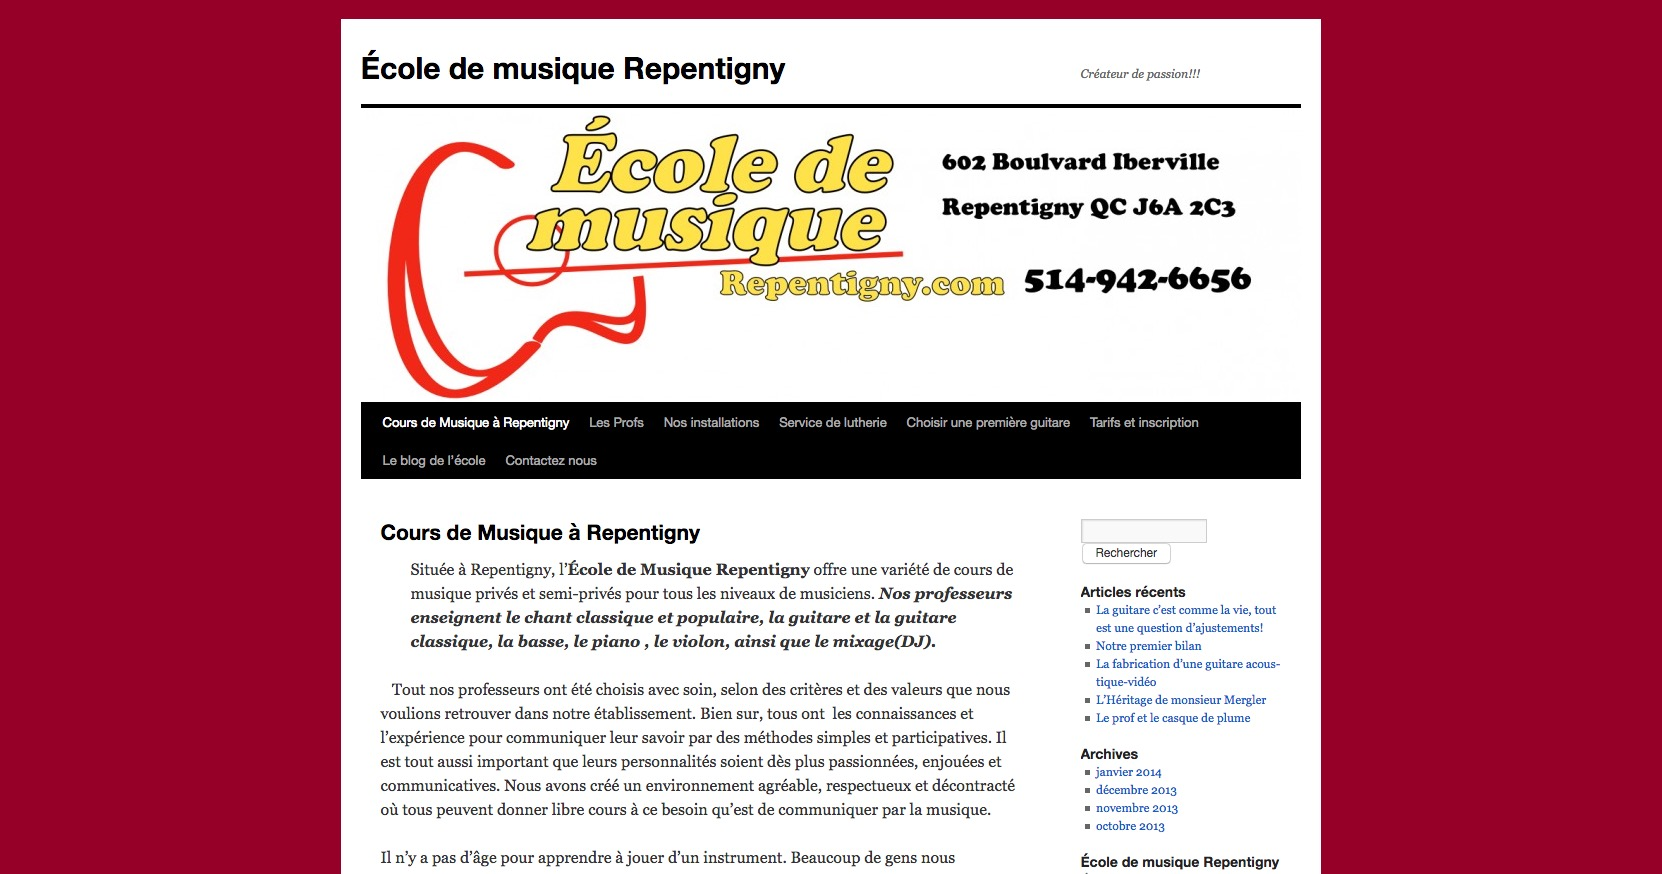 École de musique Repentigny